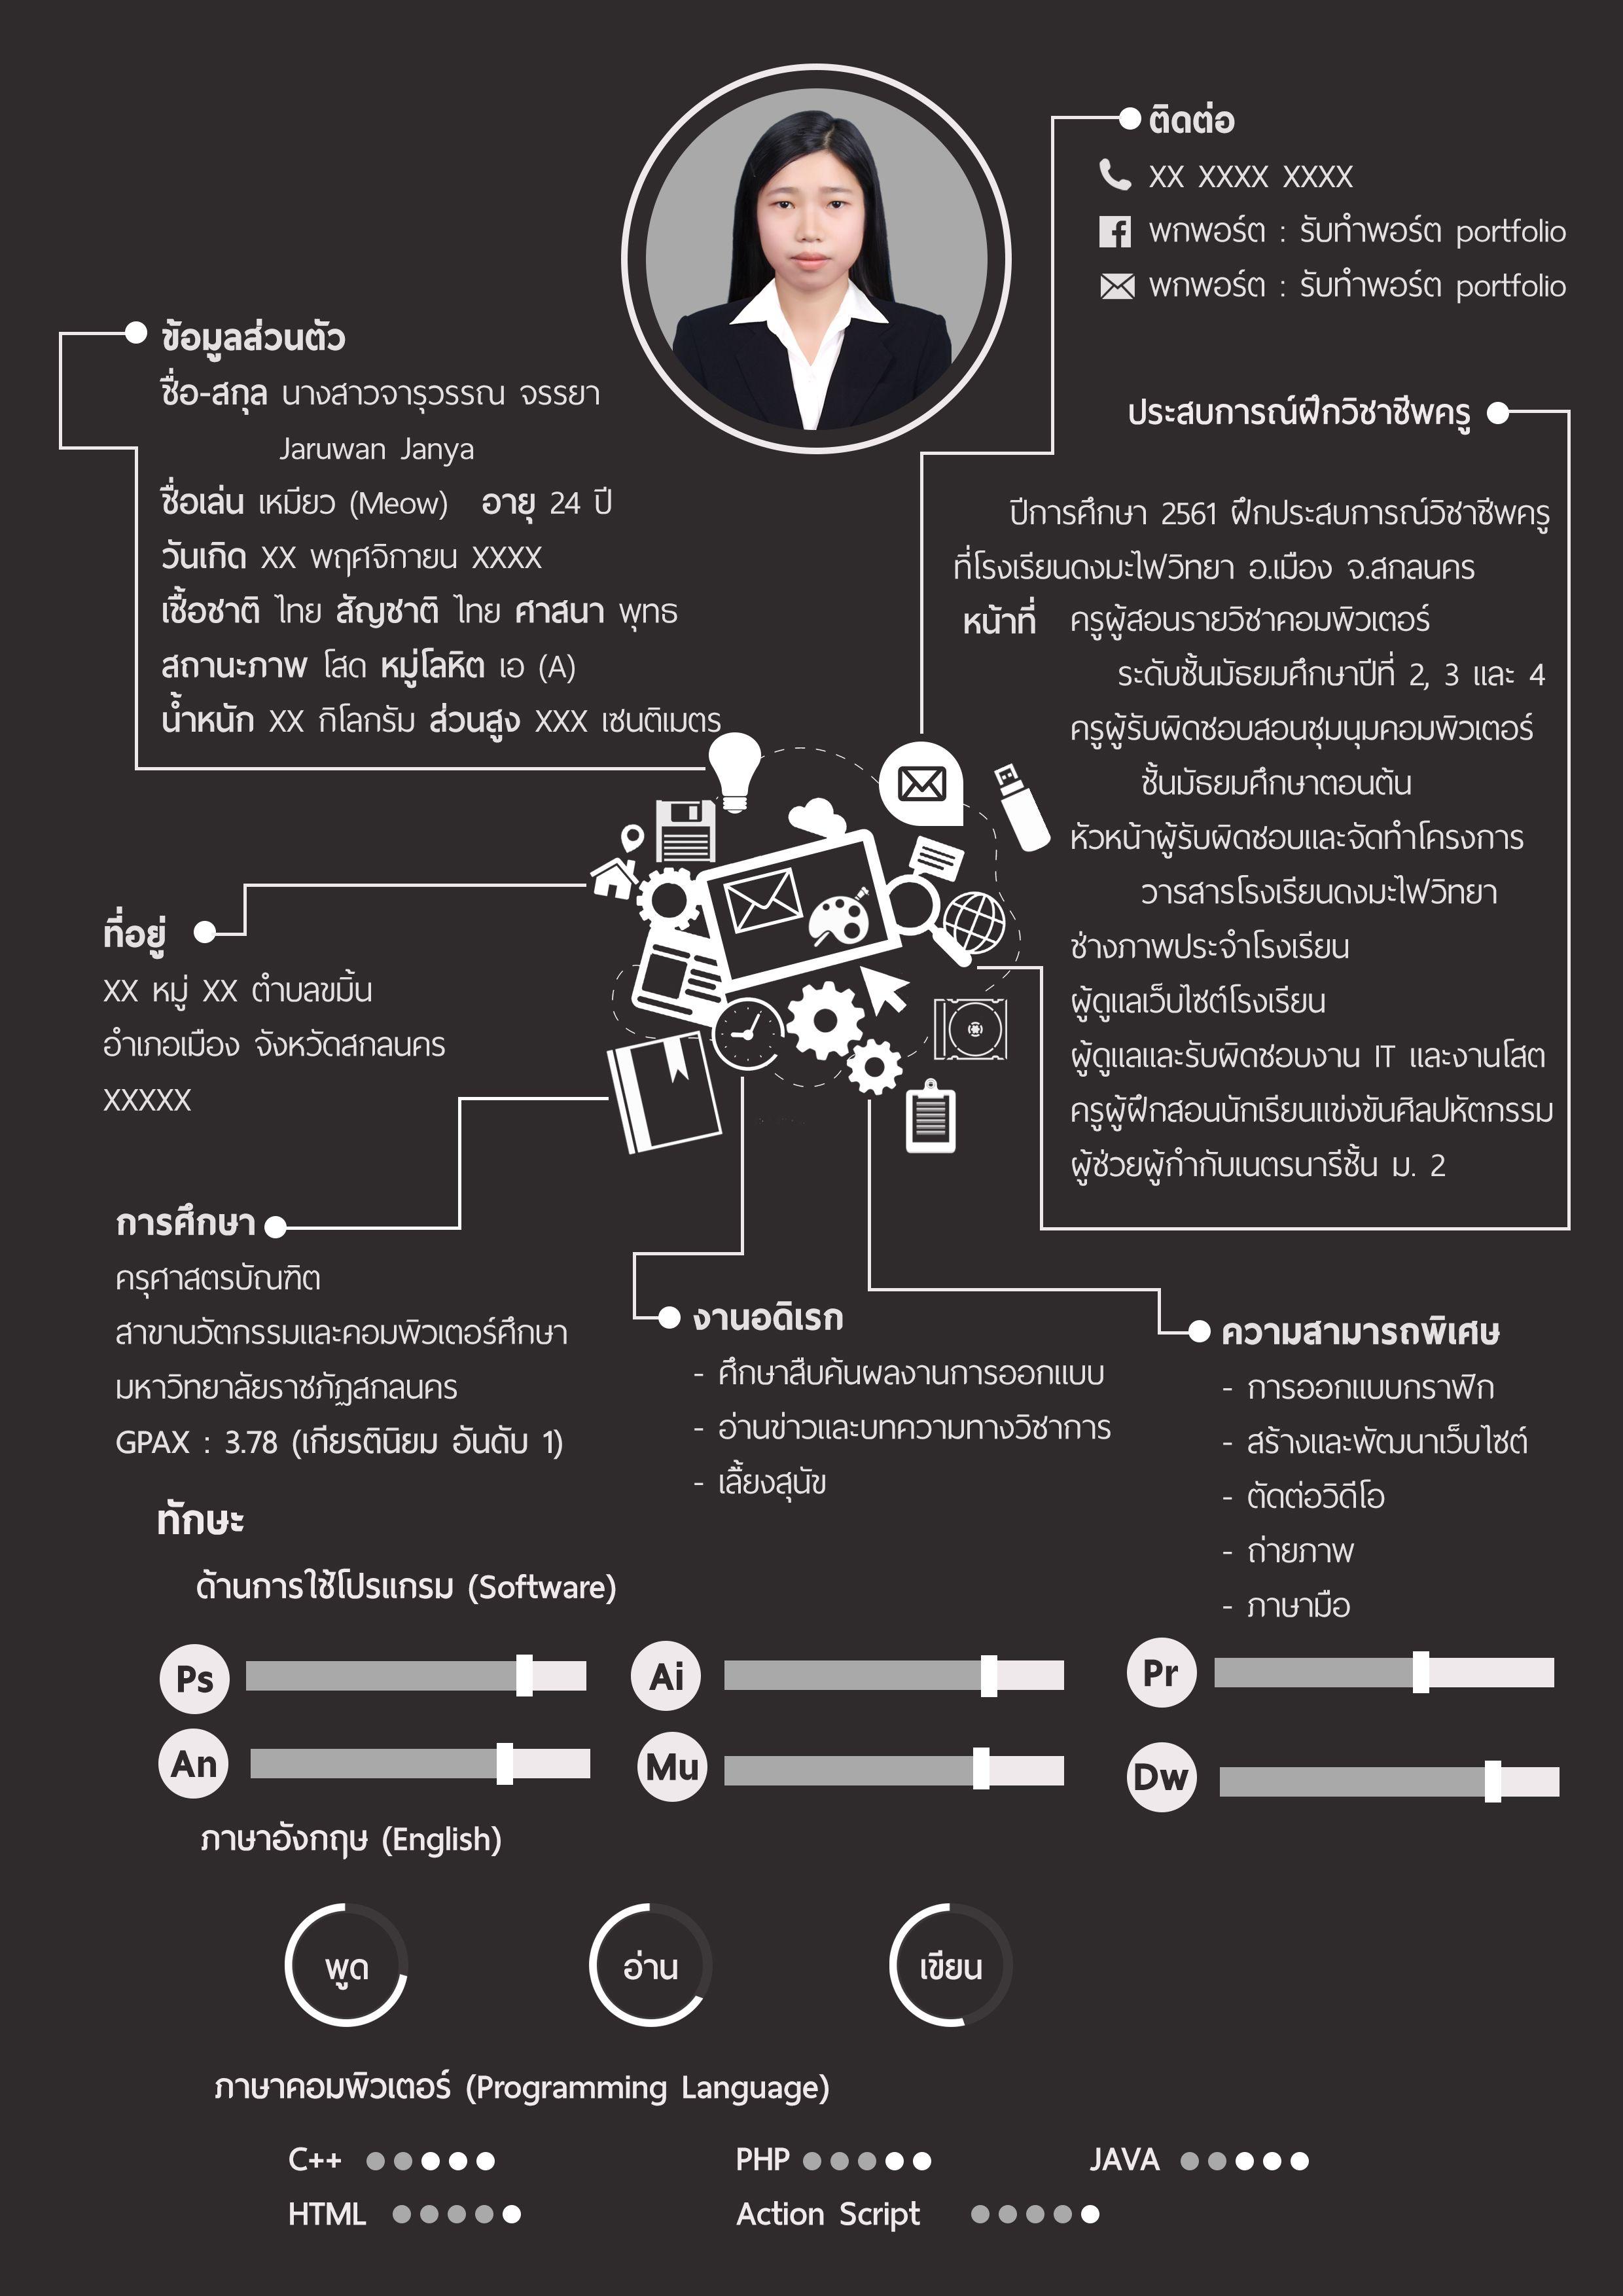 Resume Portfolio Design พอร์ต พอต ตัวอย่างพอร์ต